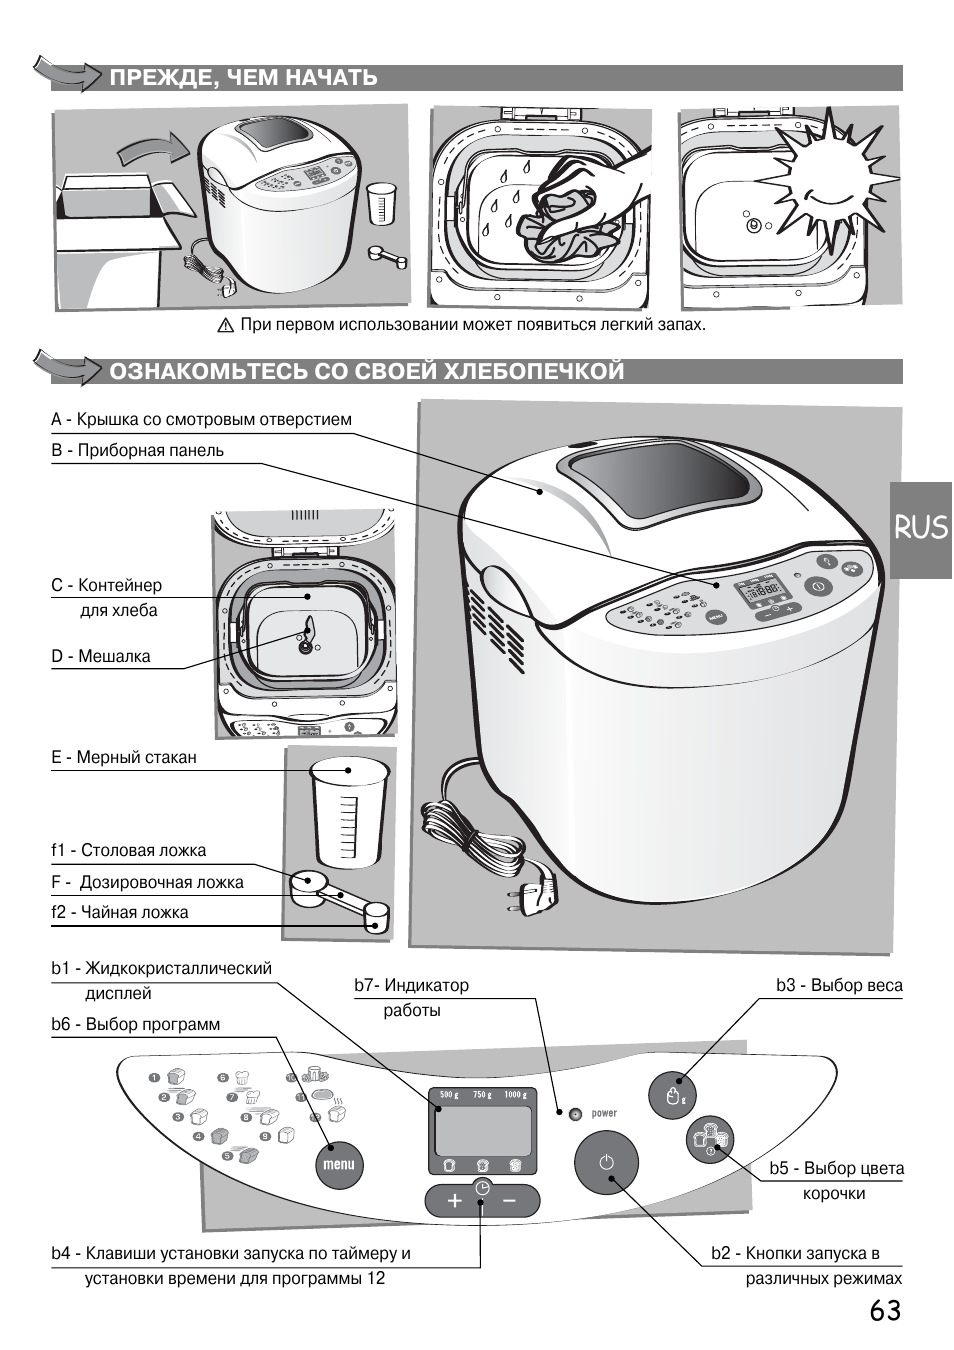 Moulinex ow2000 home bread инструкция